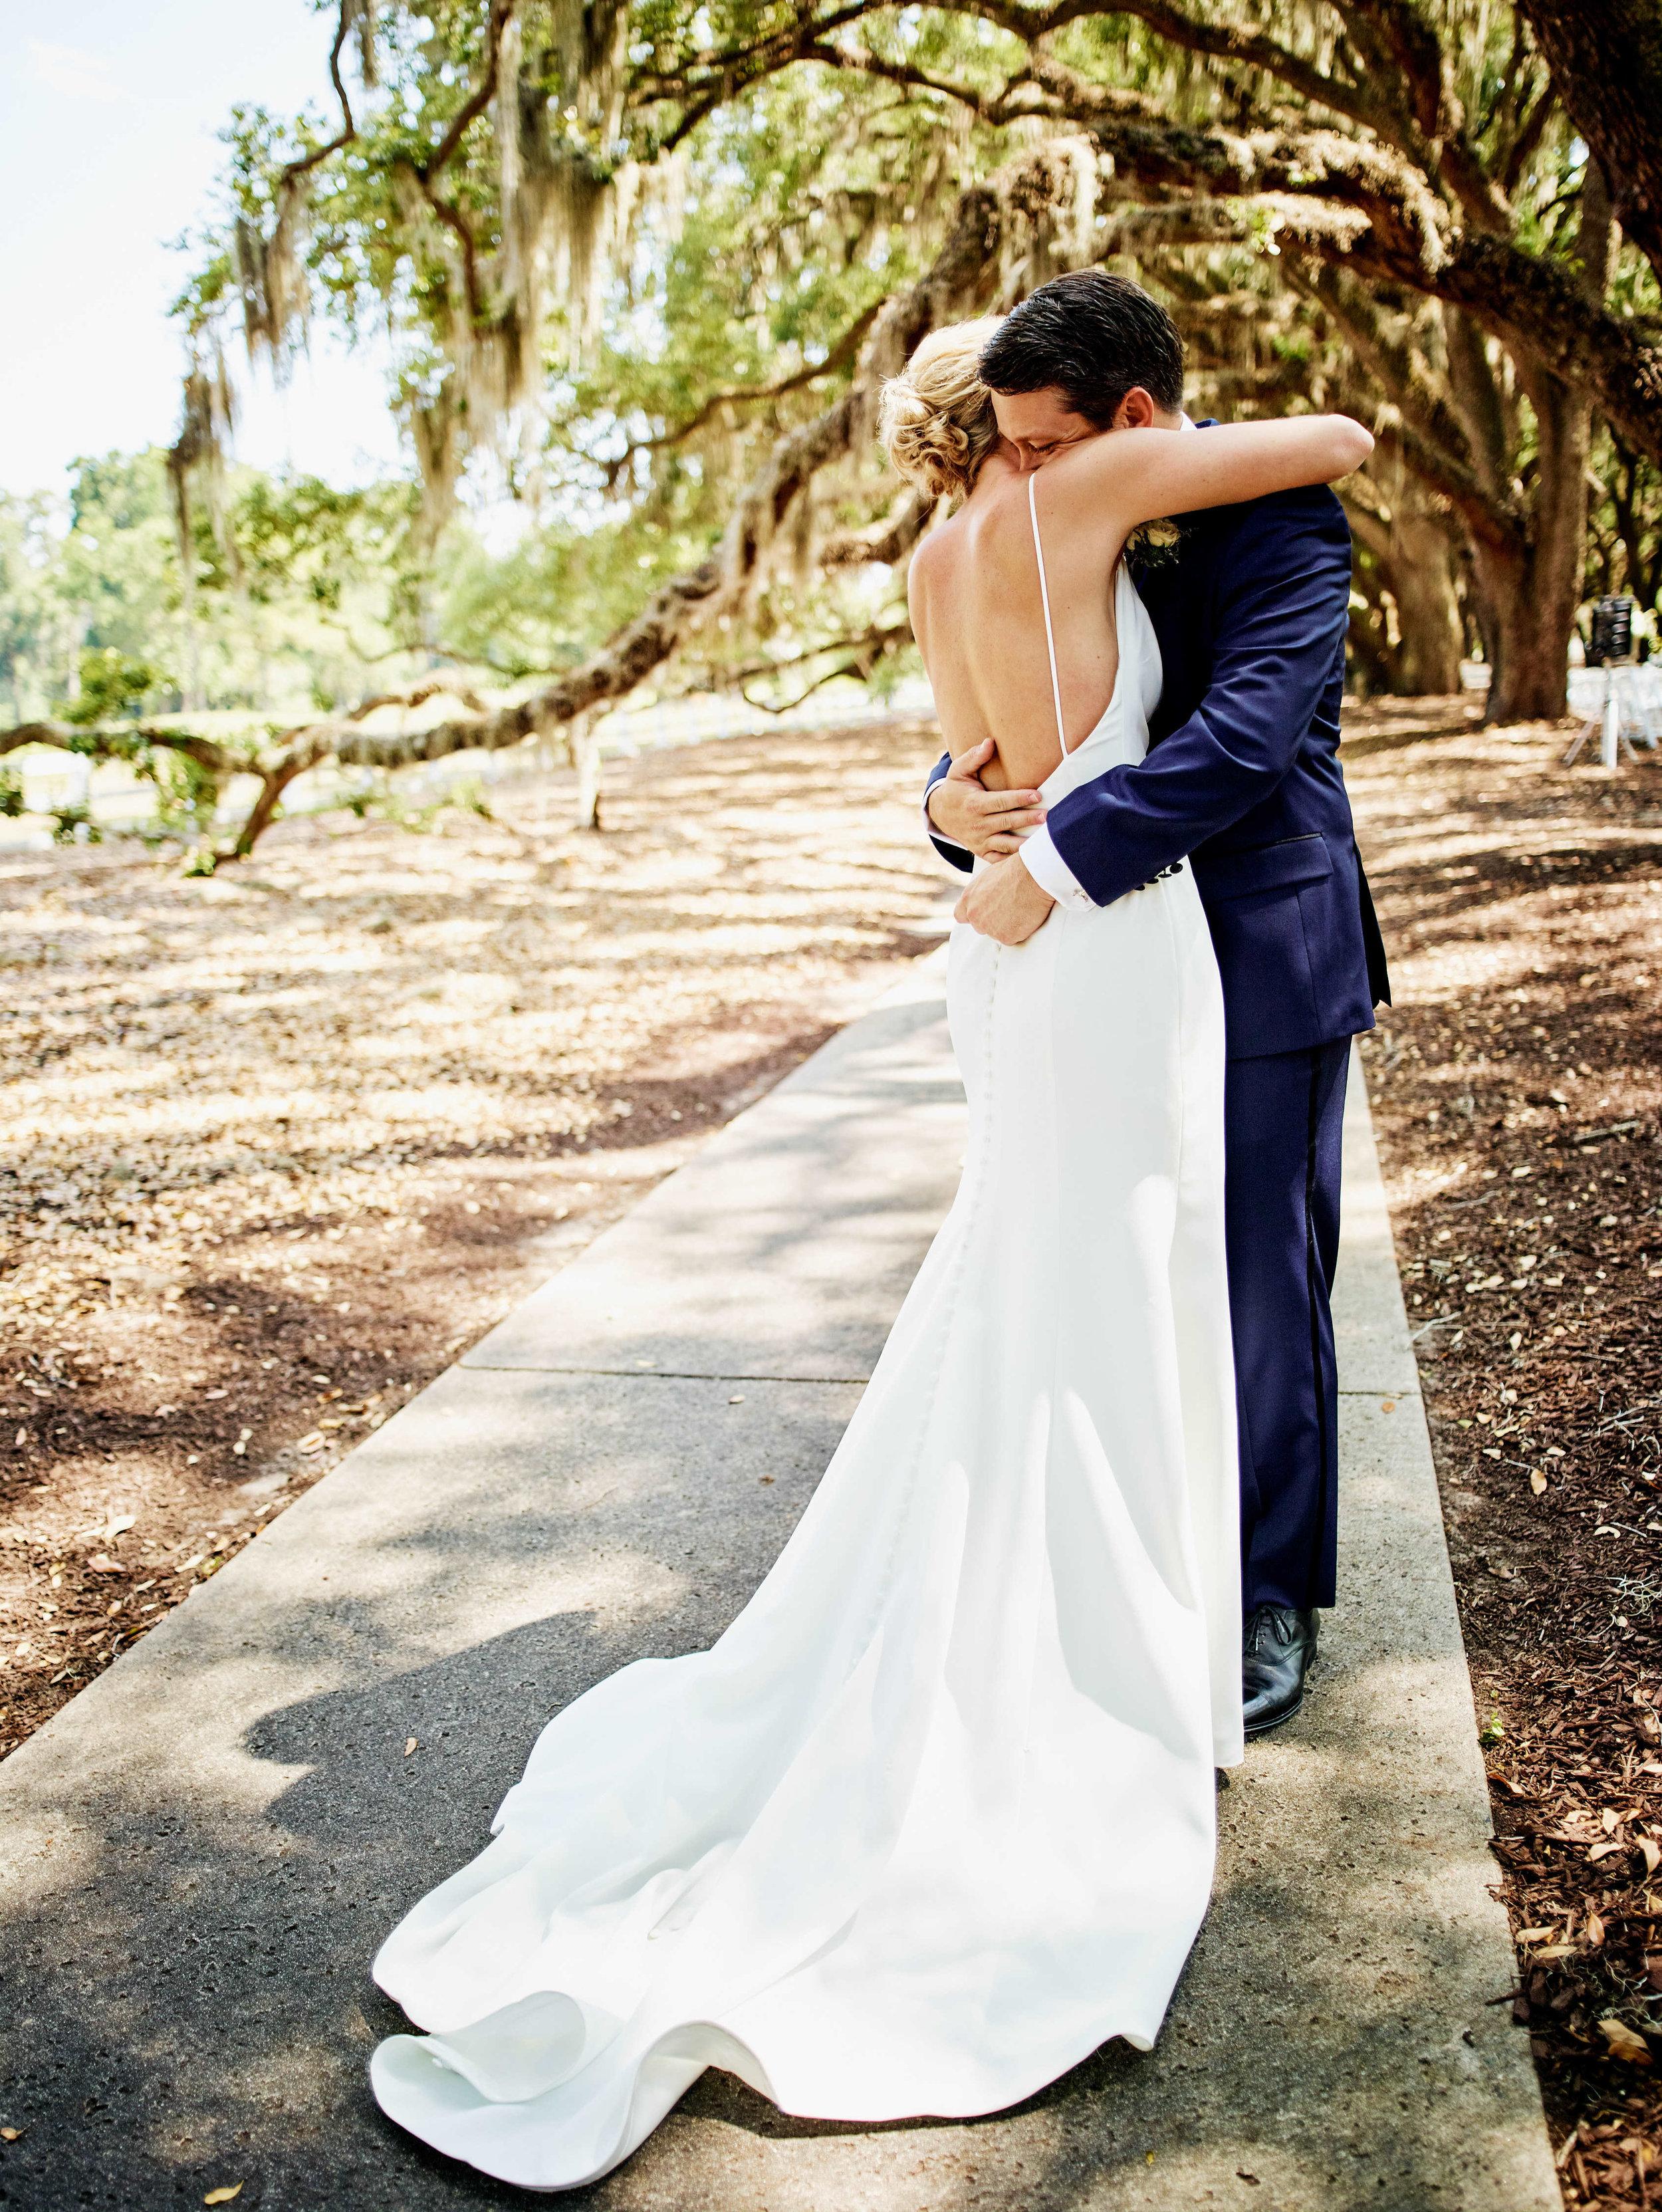 annie-and-greg-belfair-plantation-savannah-wedding-savannah-wedding-planner-first-look-bride-groom-timeless-classic-beautiful-sweet.jpg